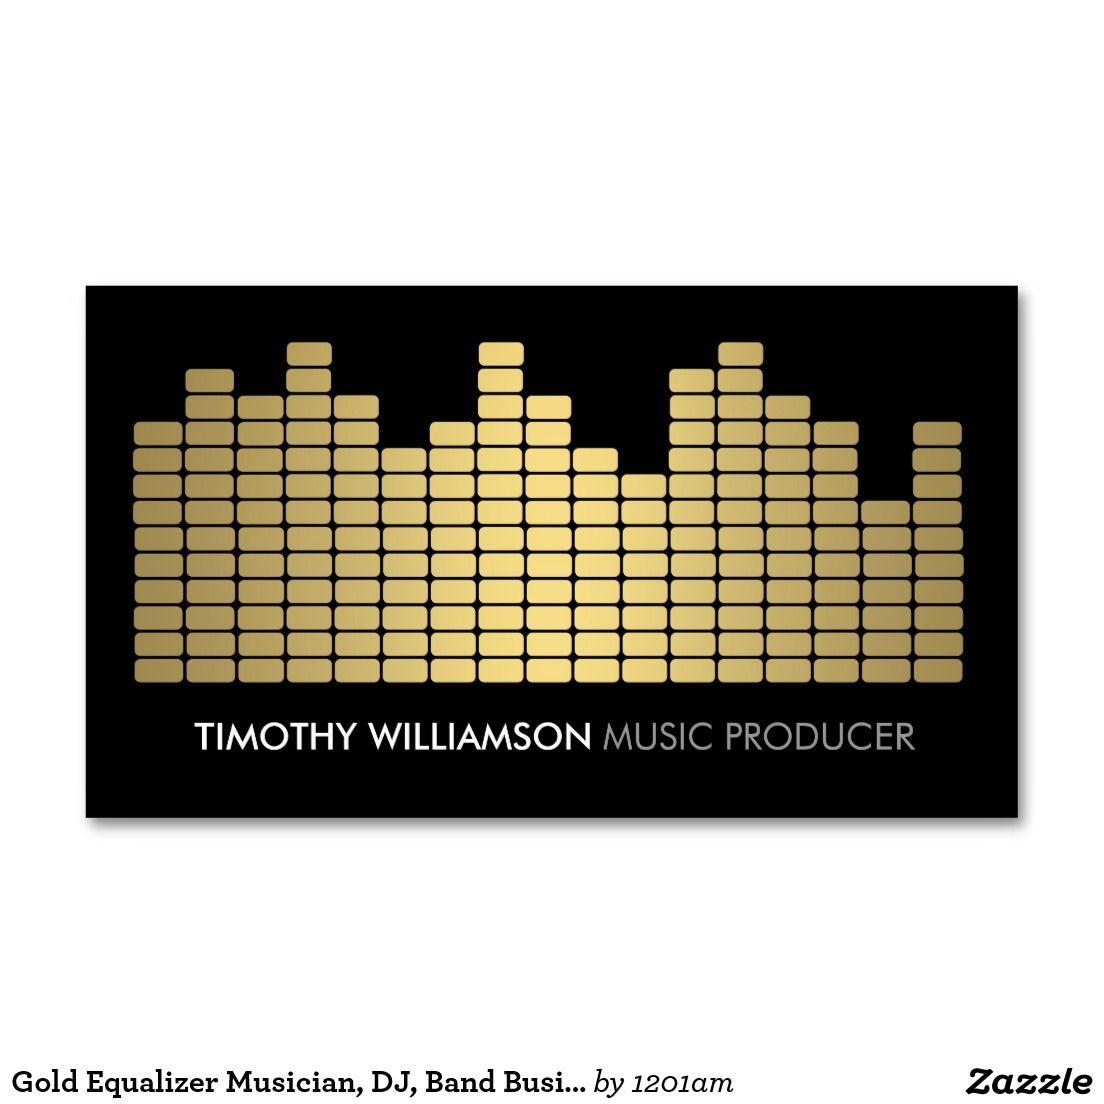 Gold Equalizer Musician, DJ, Band Business Card | Dj, Business cards ...